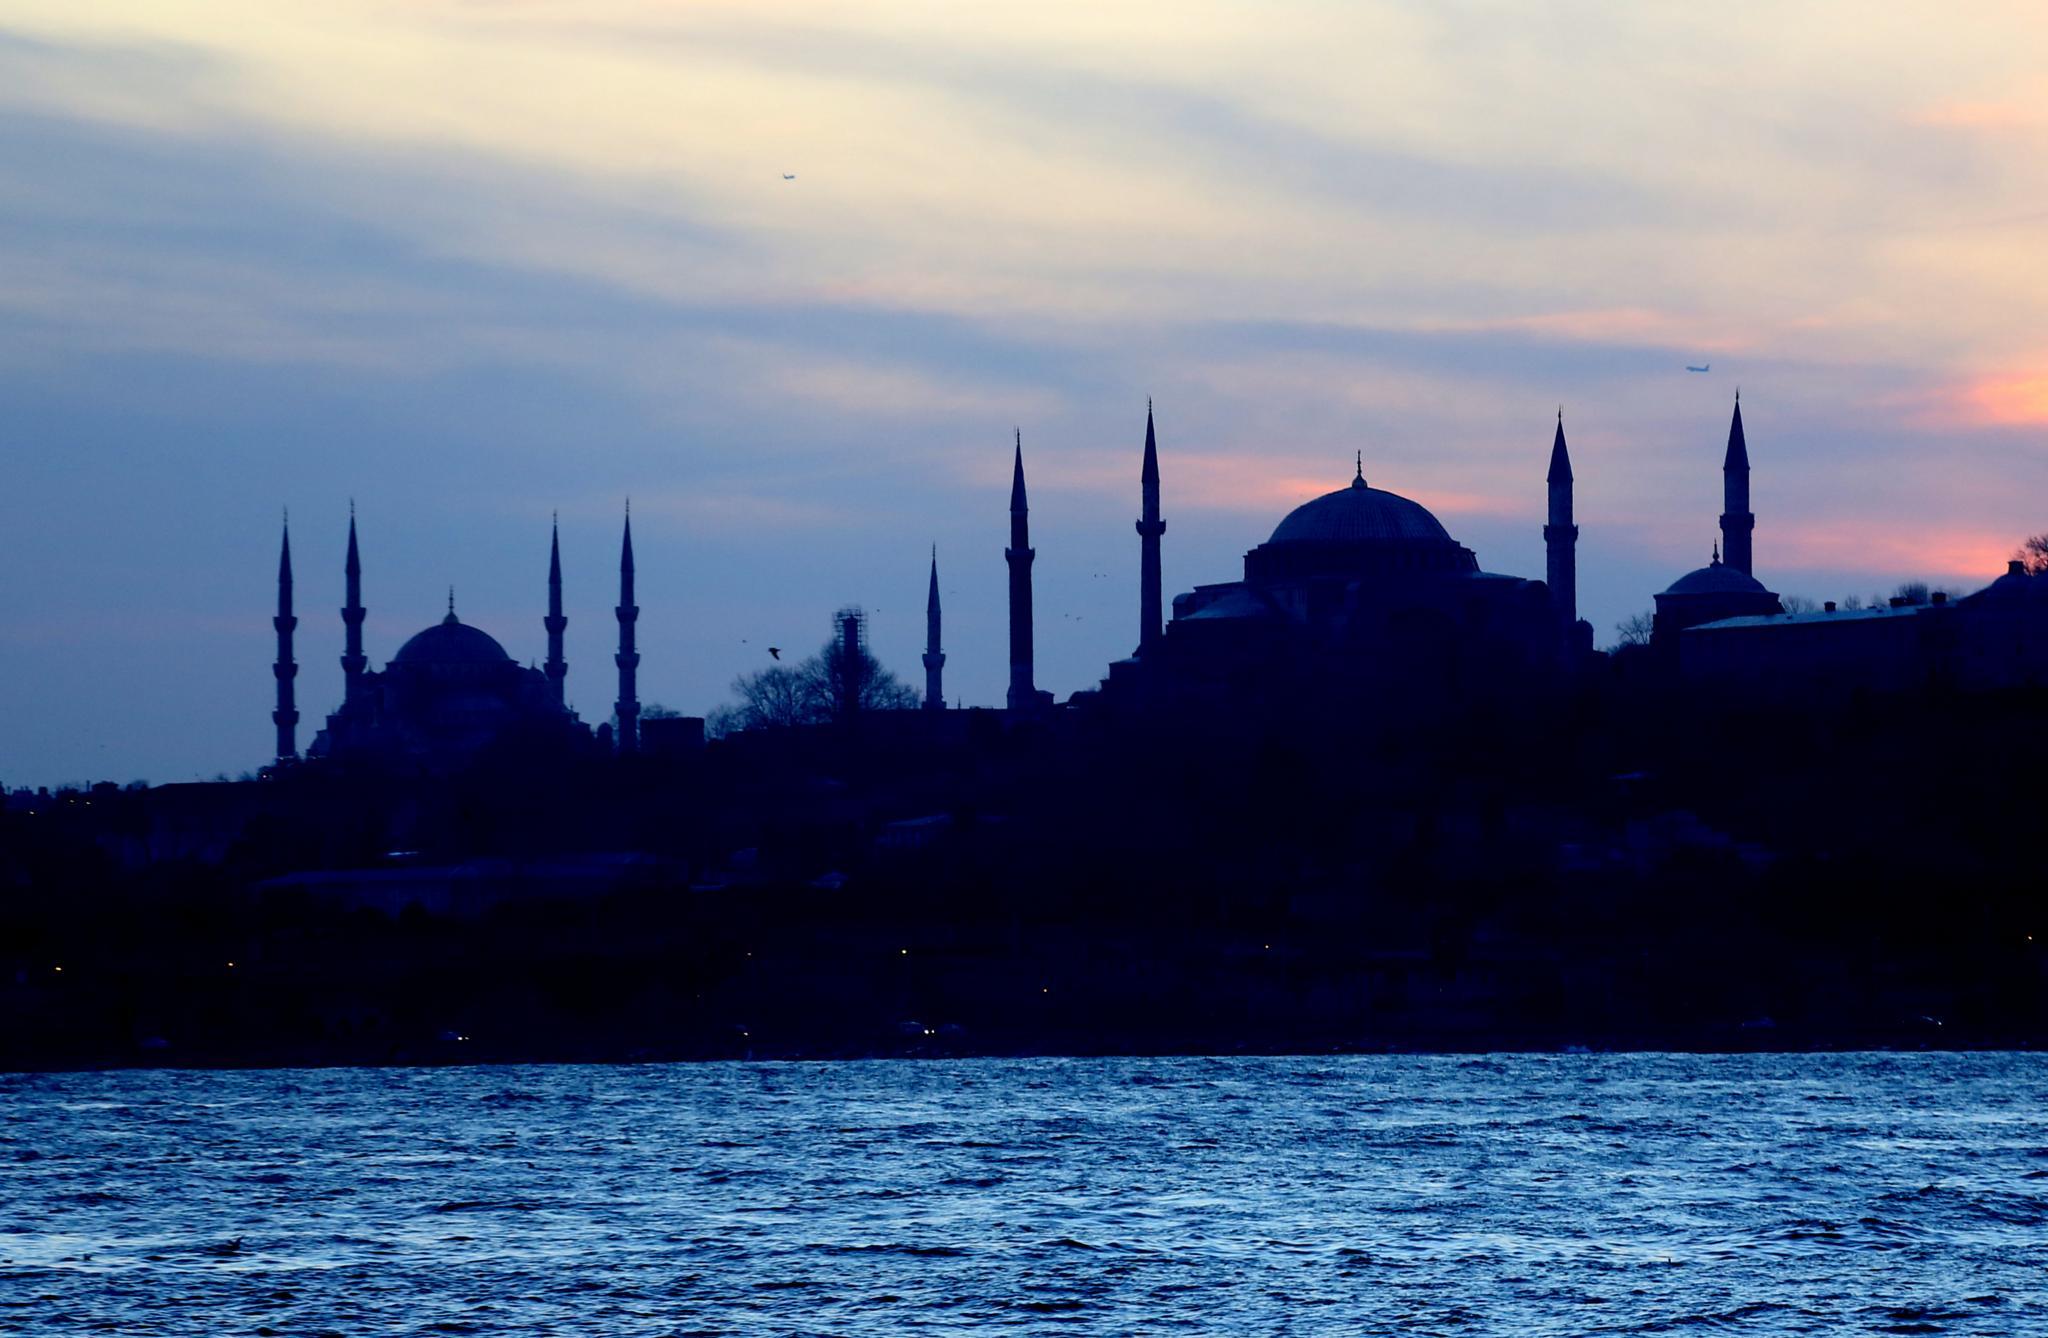 Silhouette of the Mosques by Atila_Yumusakkaya